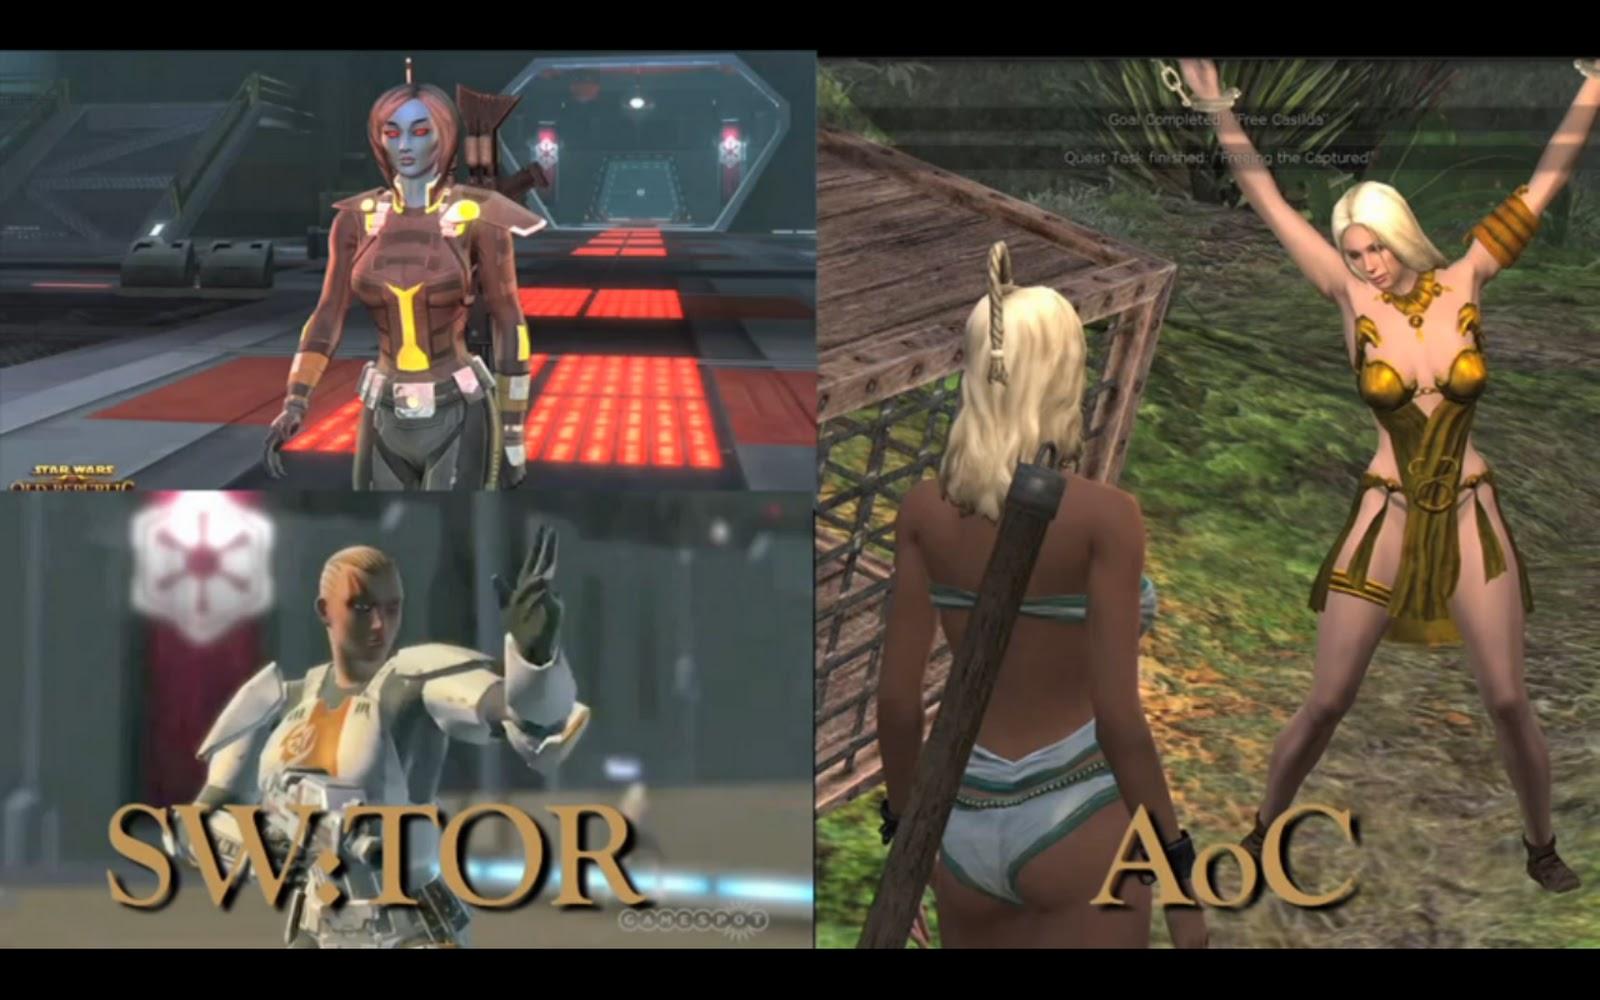 http://3.bp.blogspot.com/-r7nFXJY9pQ4/TWKFTC-aVII/AAAAAAAAEF8/di0t3WyTFgw/s1600/Age+of+Conan+vs+SWTOR+4.bmp